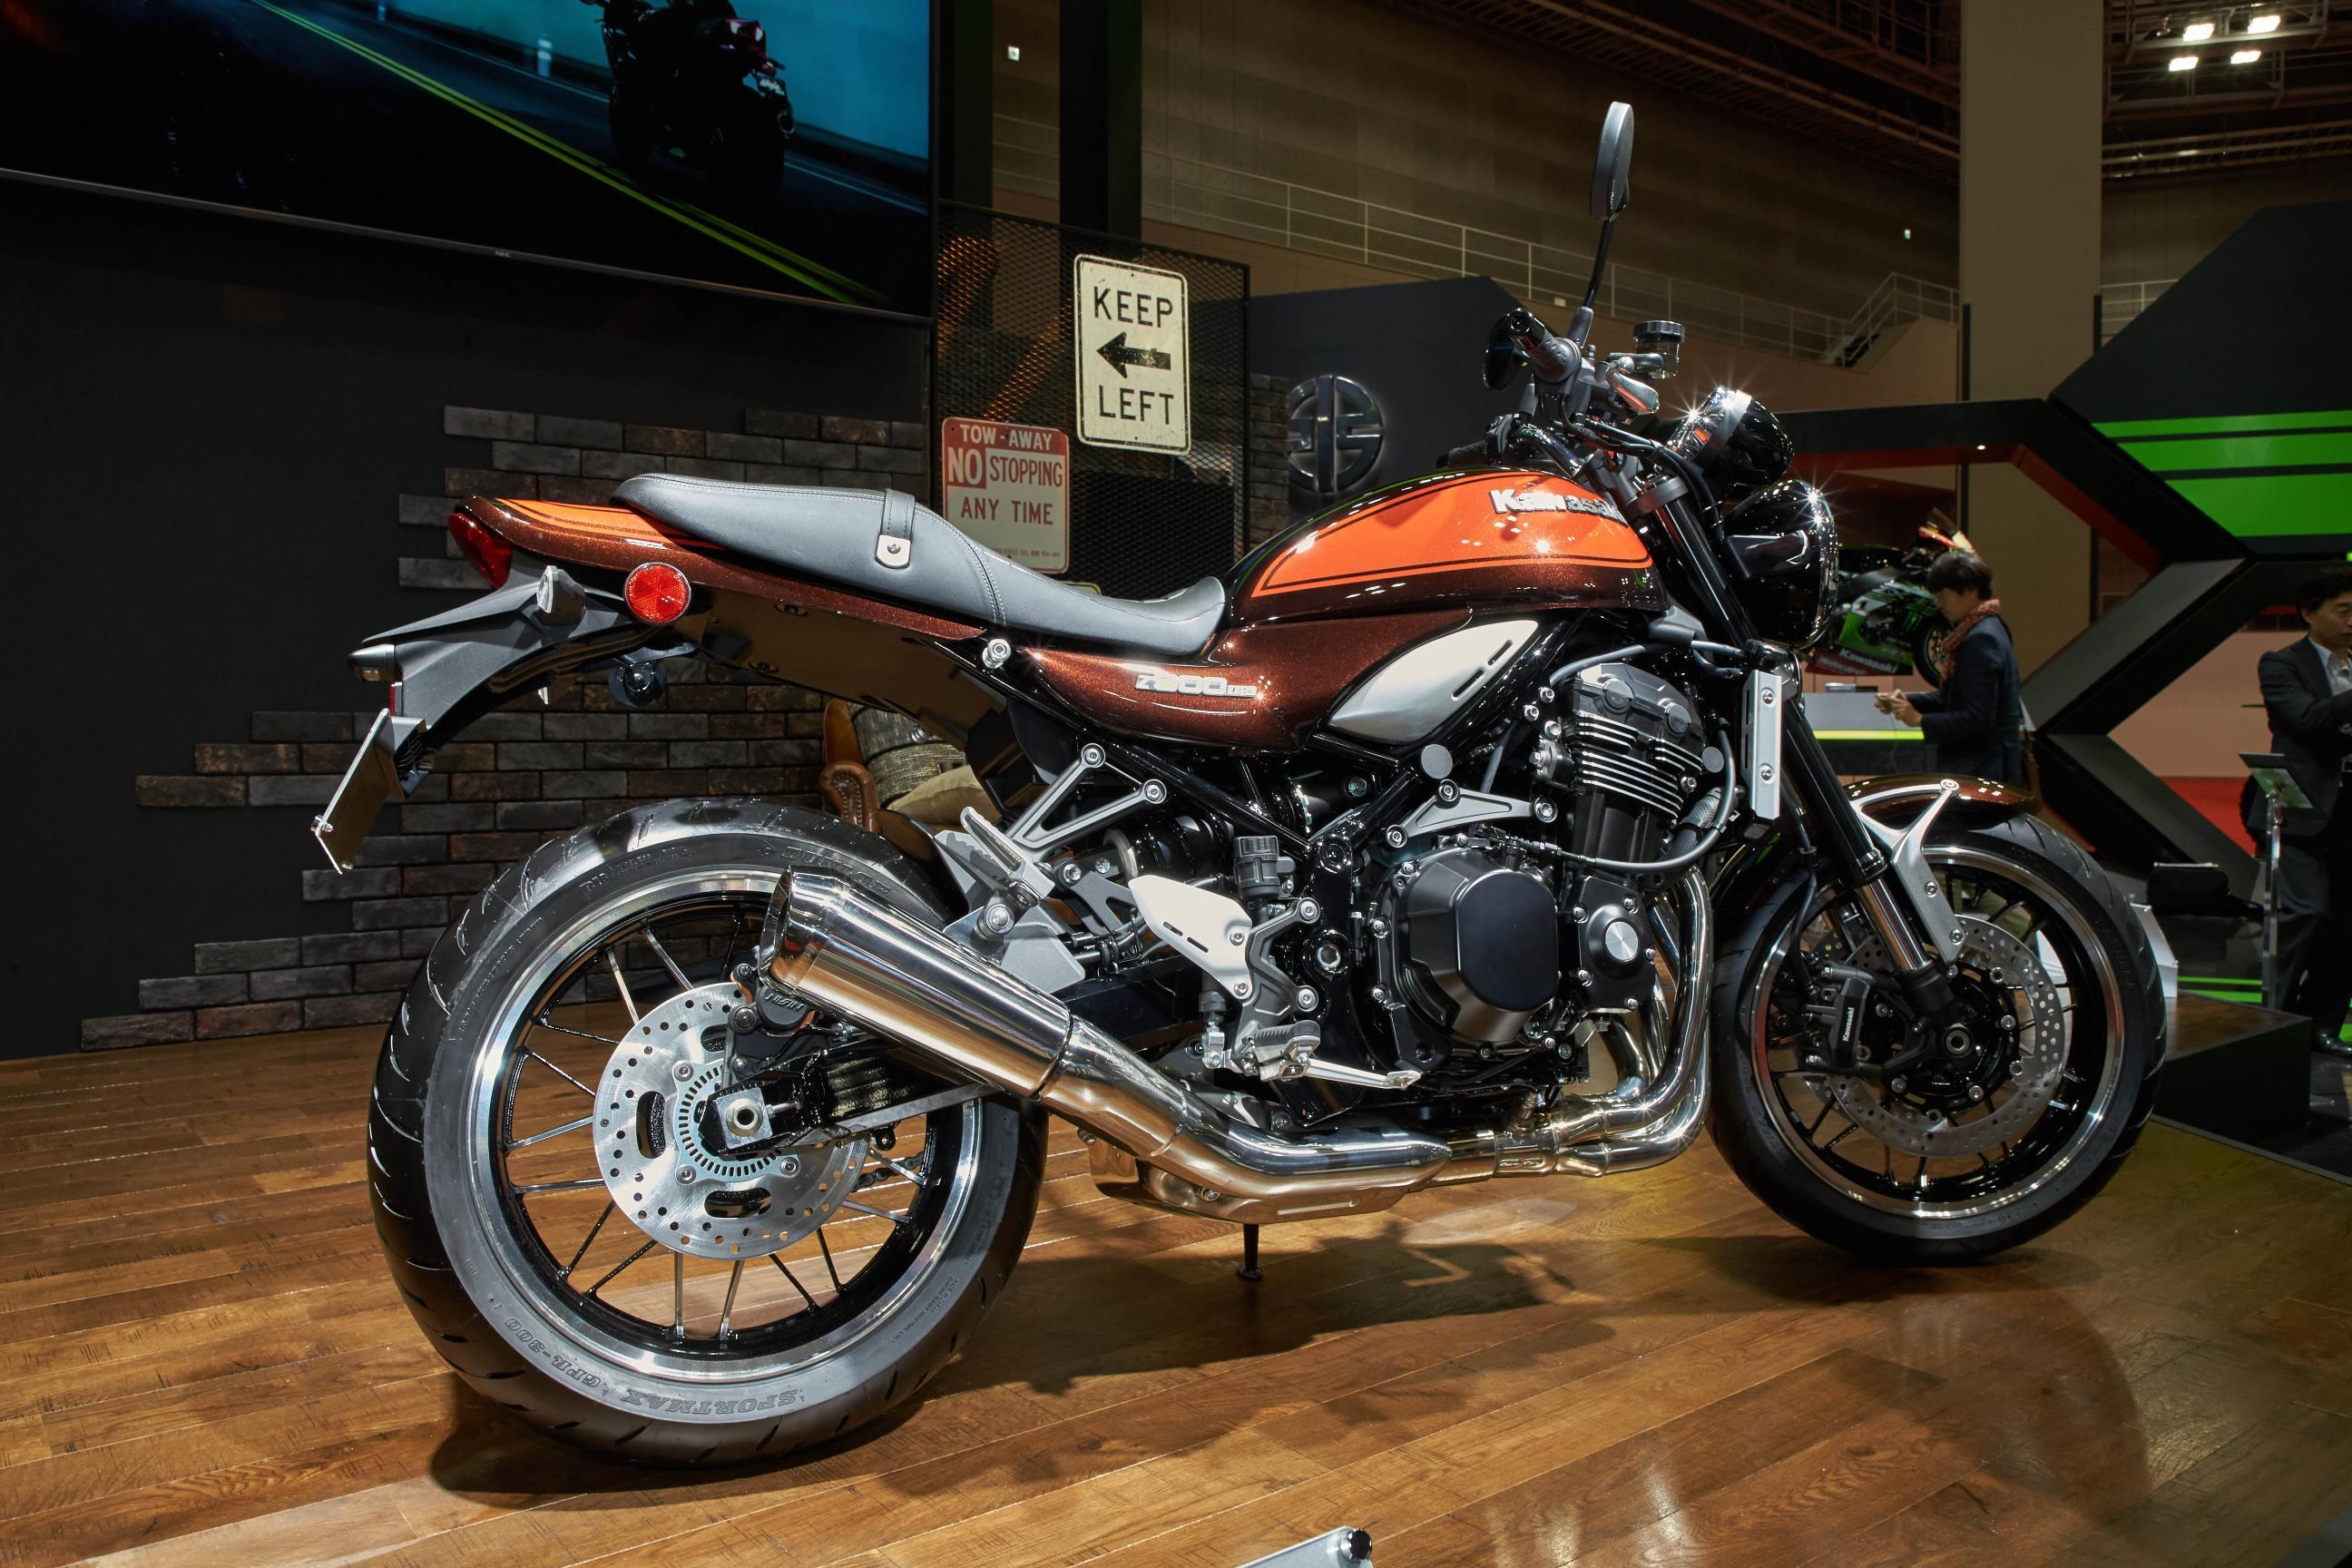 Tokyo motor show 2017 (282)